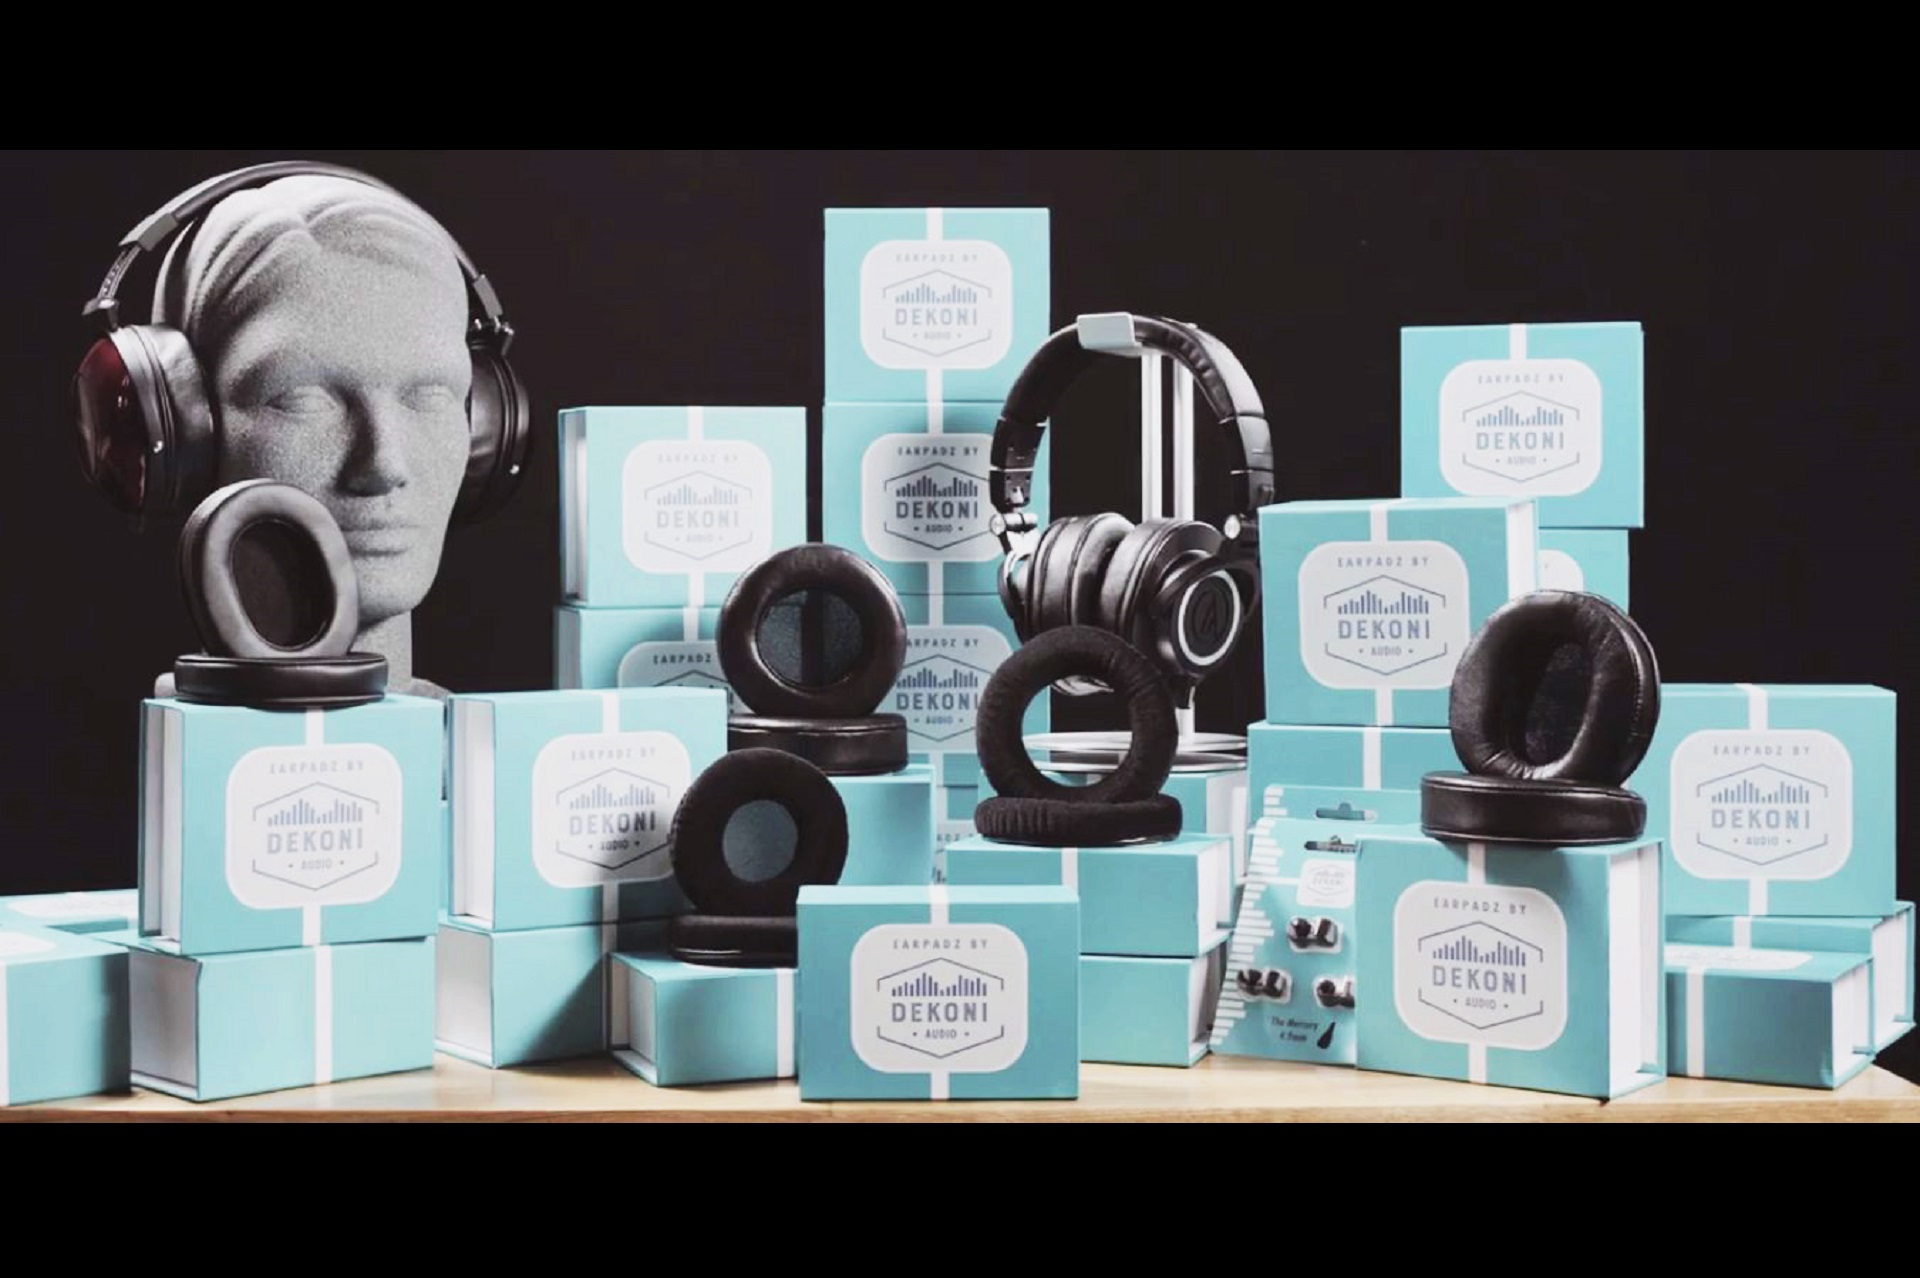 【DEKONI AUDIO】宮地商会ブース試聴で話題のイヤーチップをプレゼント!